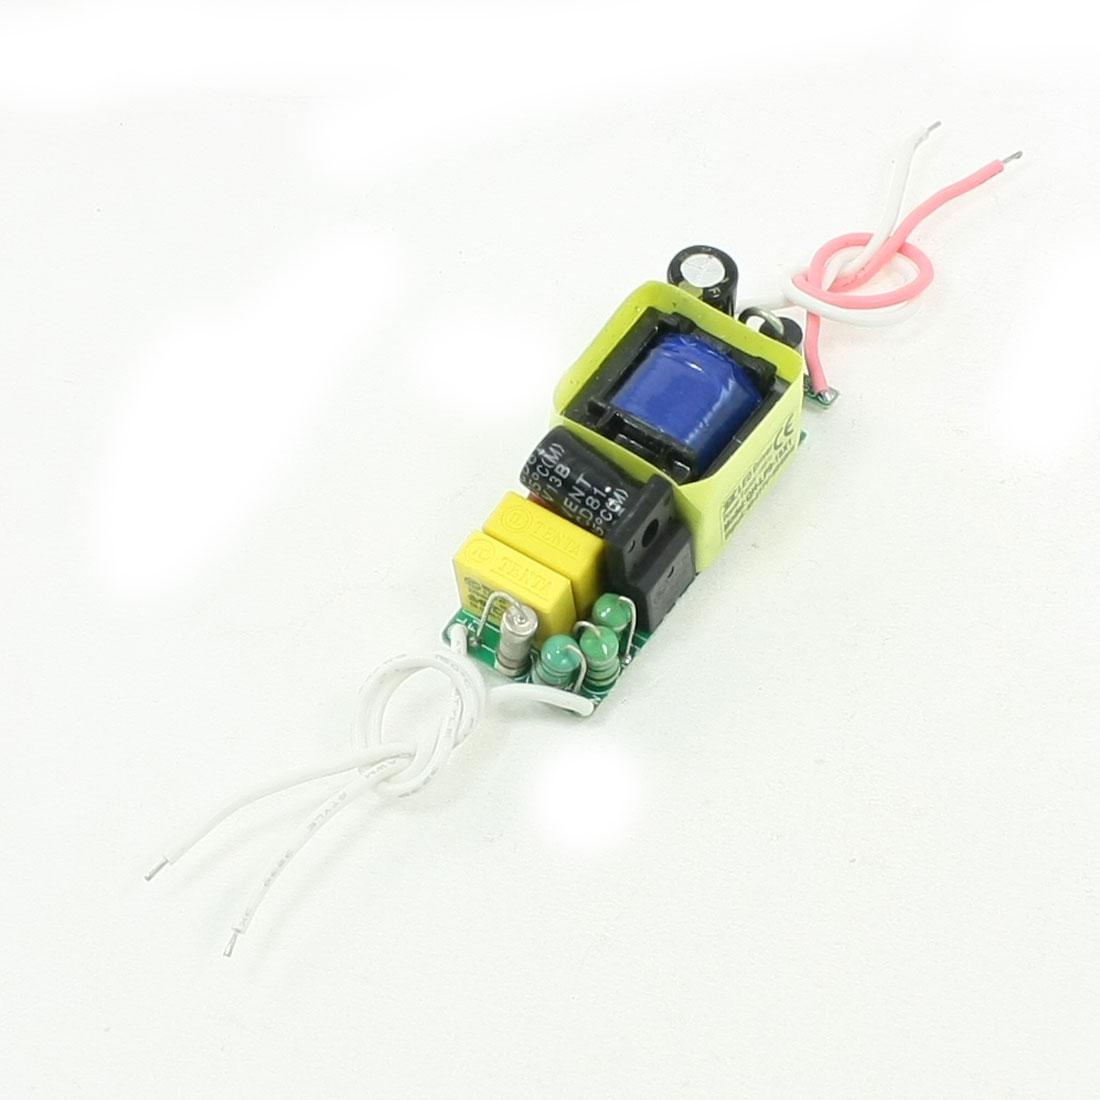 AC 110-220V DC 30-66V 300mA Power Supply Adapter for 11-18x1W LED Strip Light